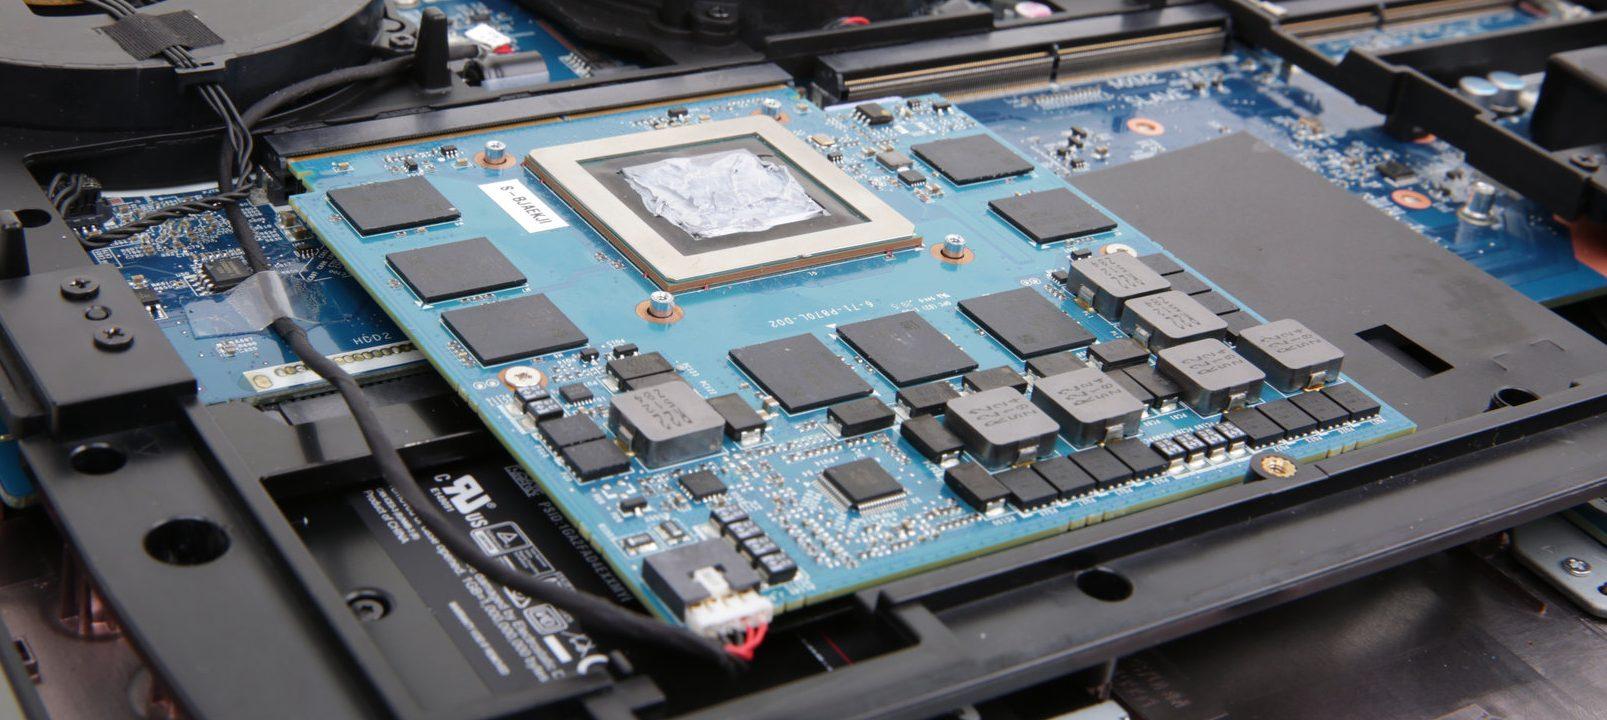 No 'GeForce GTX 1080M', but 'GTX 1080 for notebooks